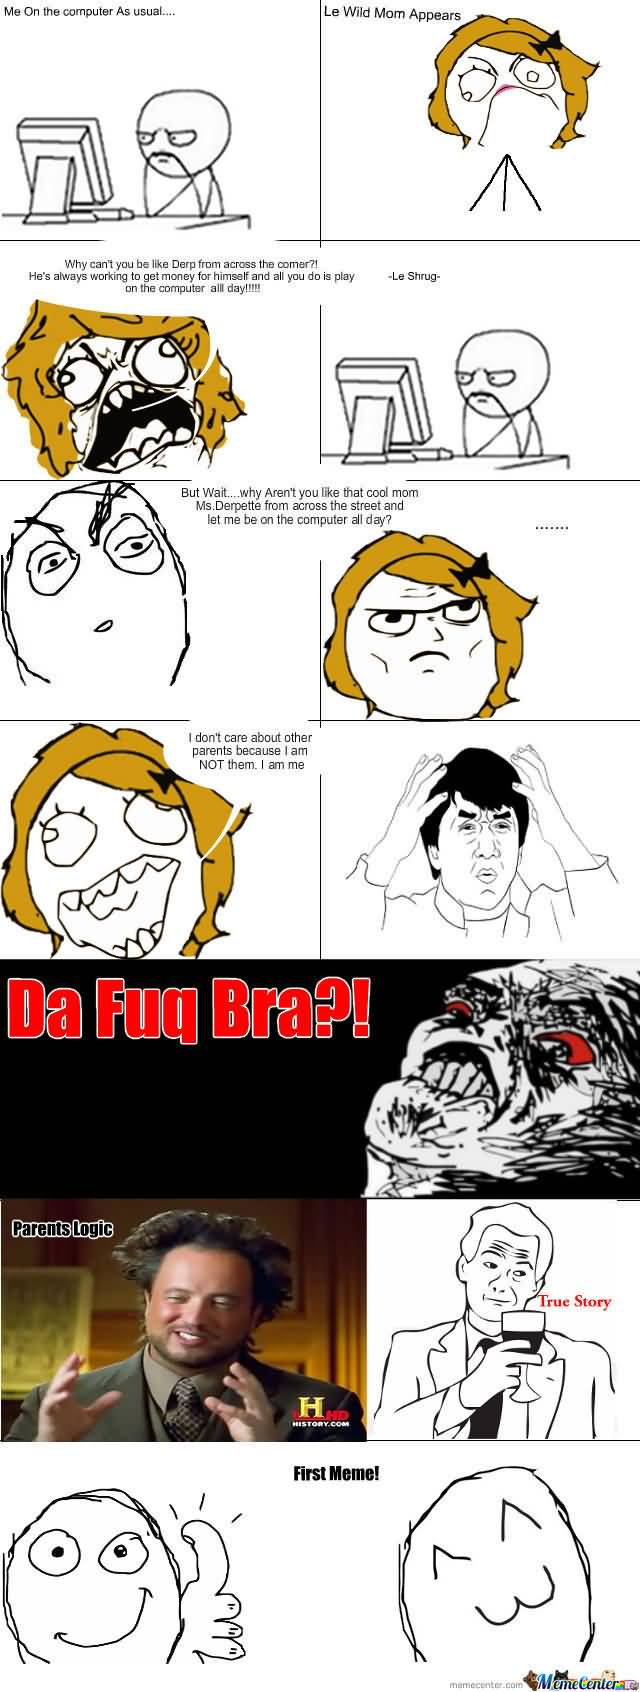 Parents Meme Funny Image Photo Joke 24